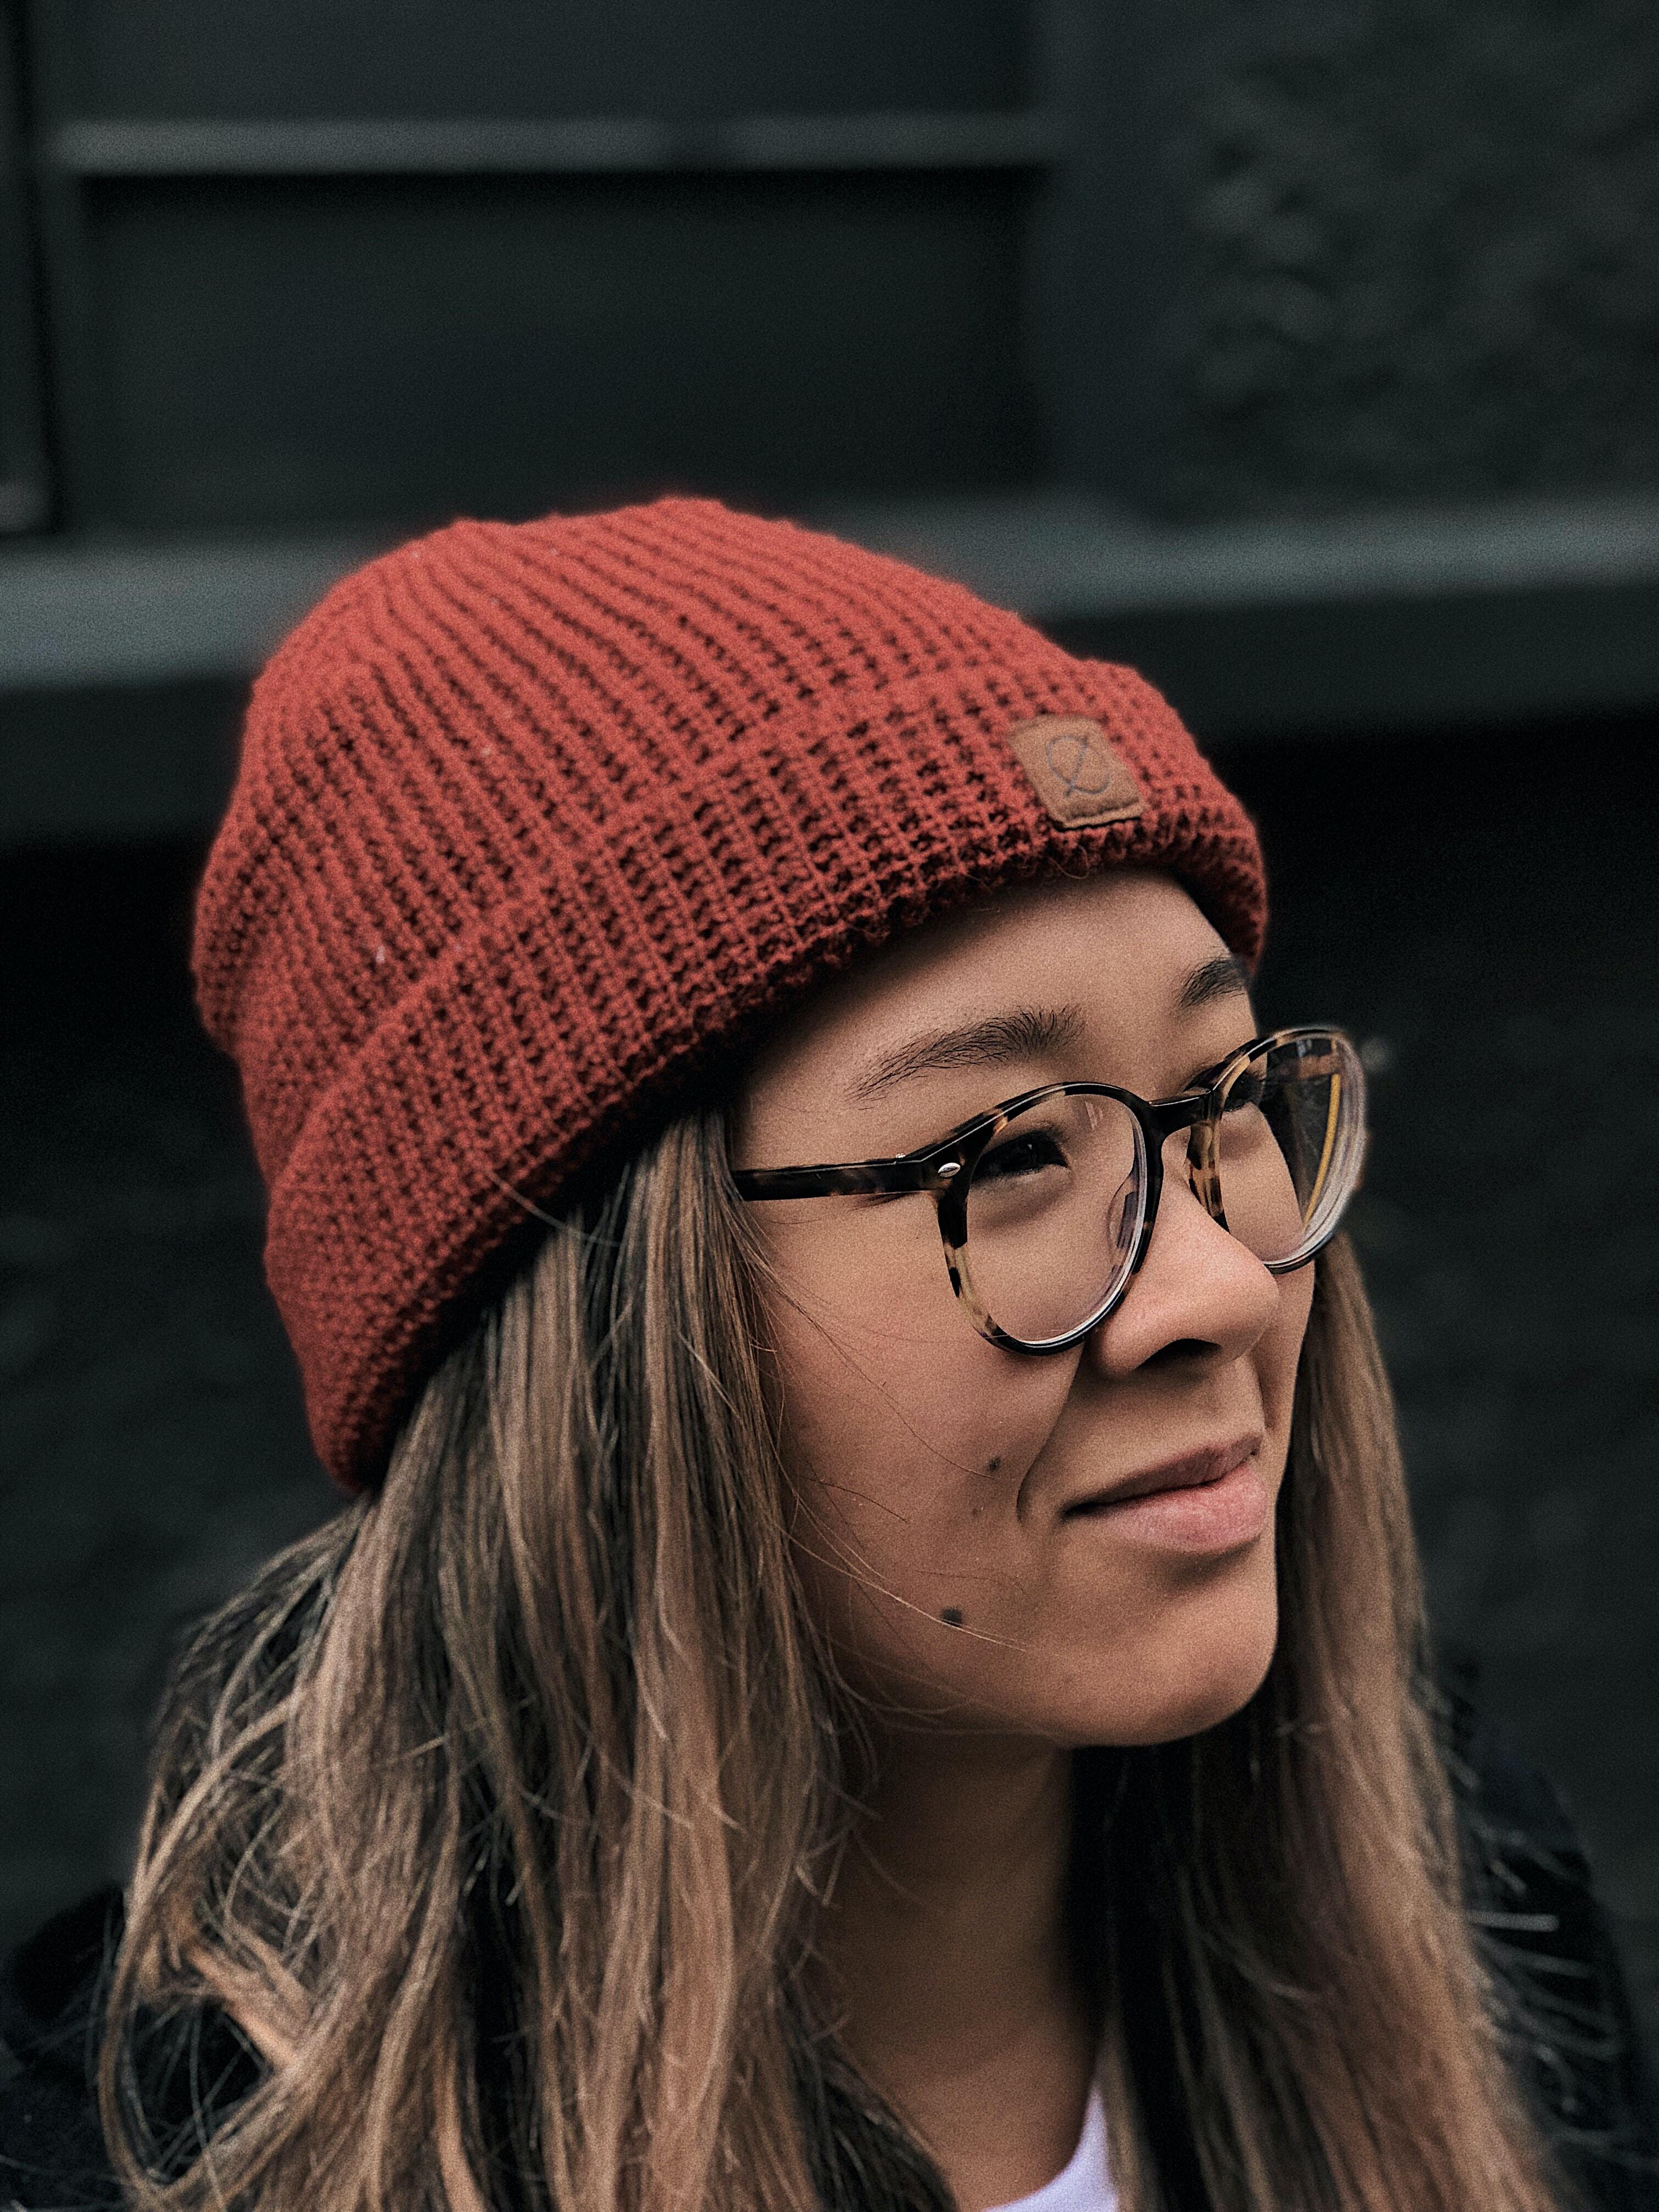 woman wearing knit cap and eyeglasses